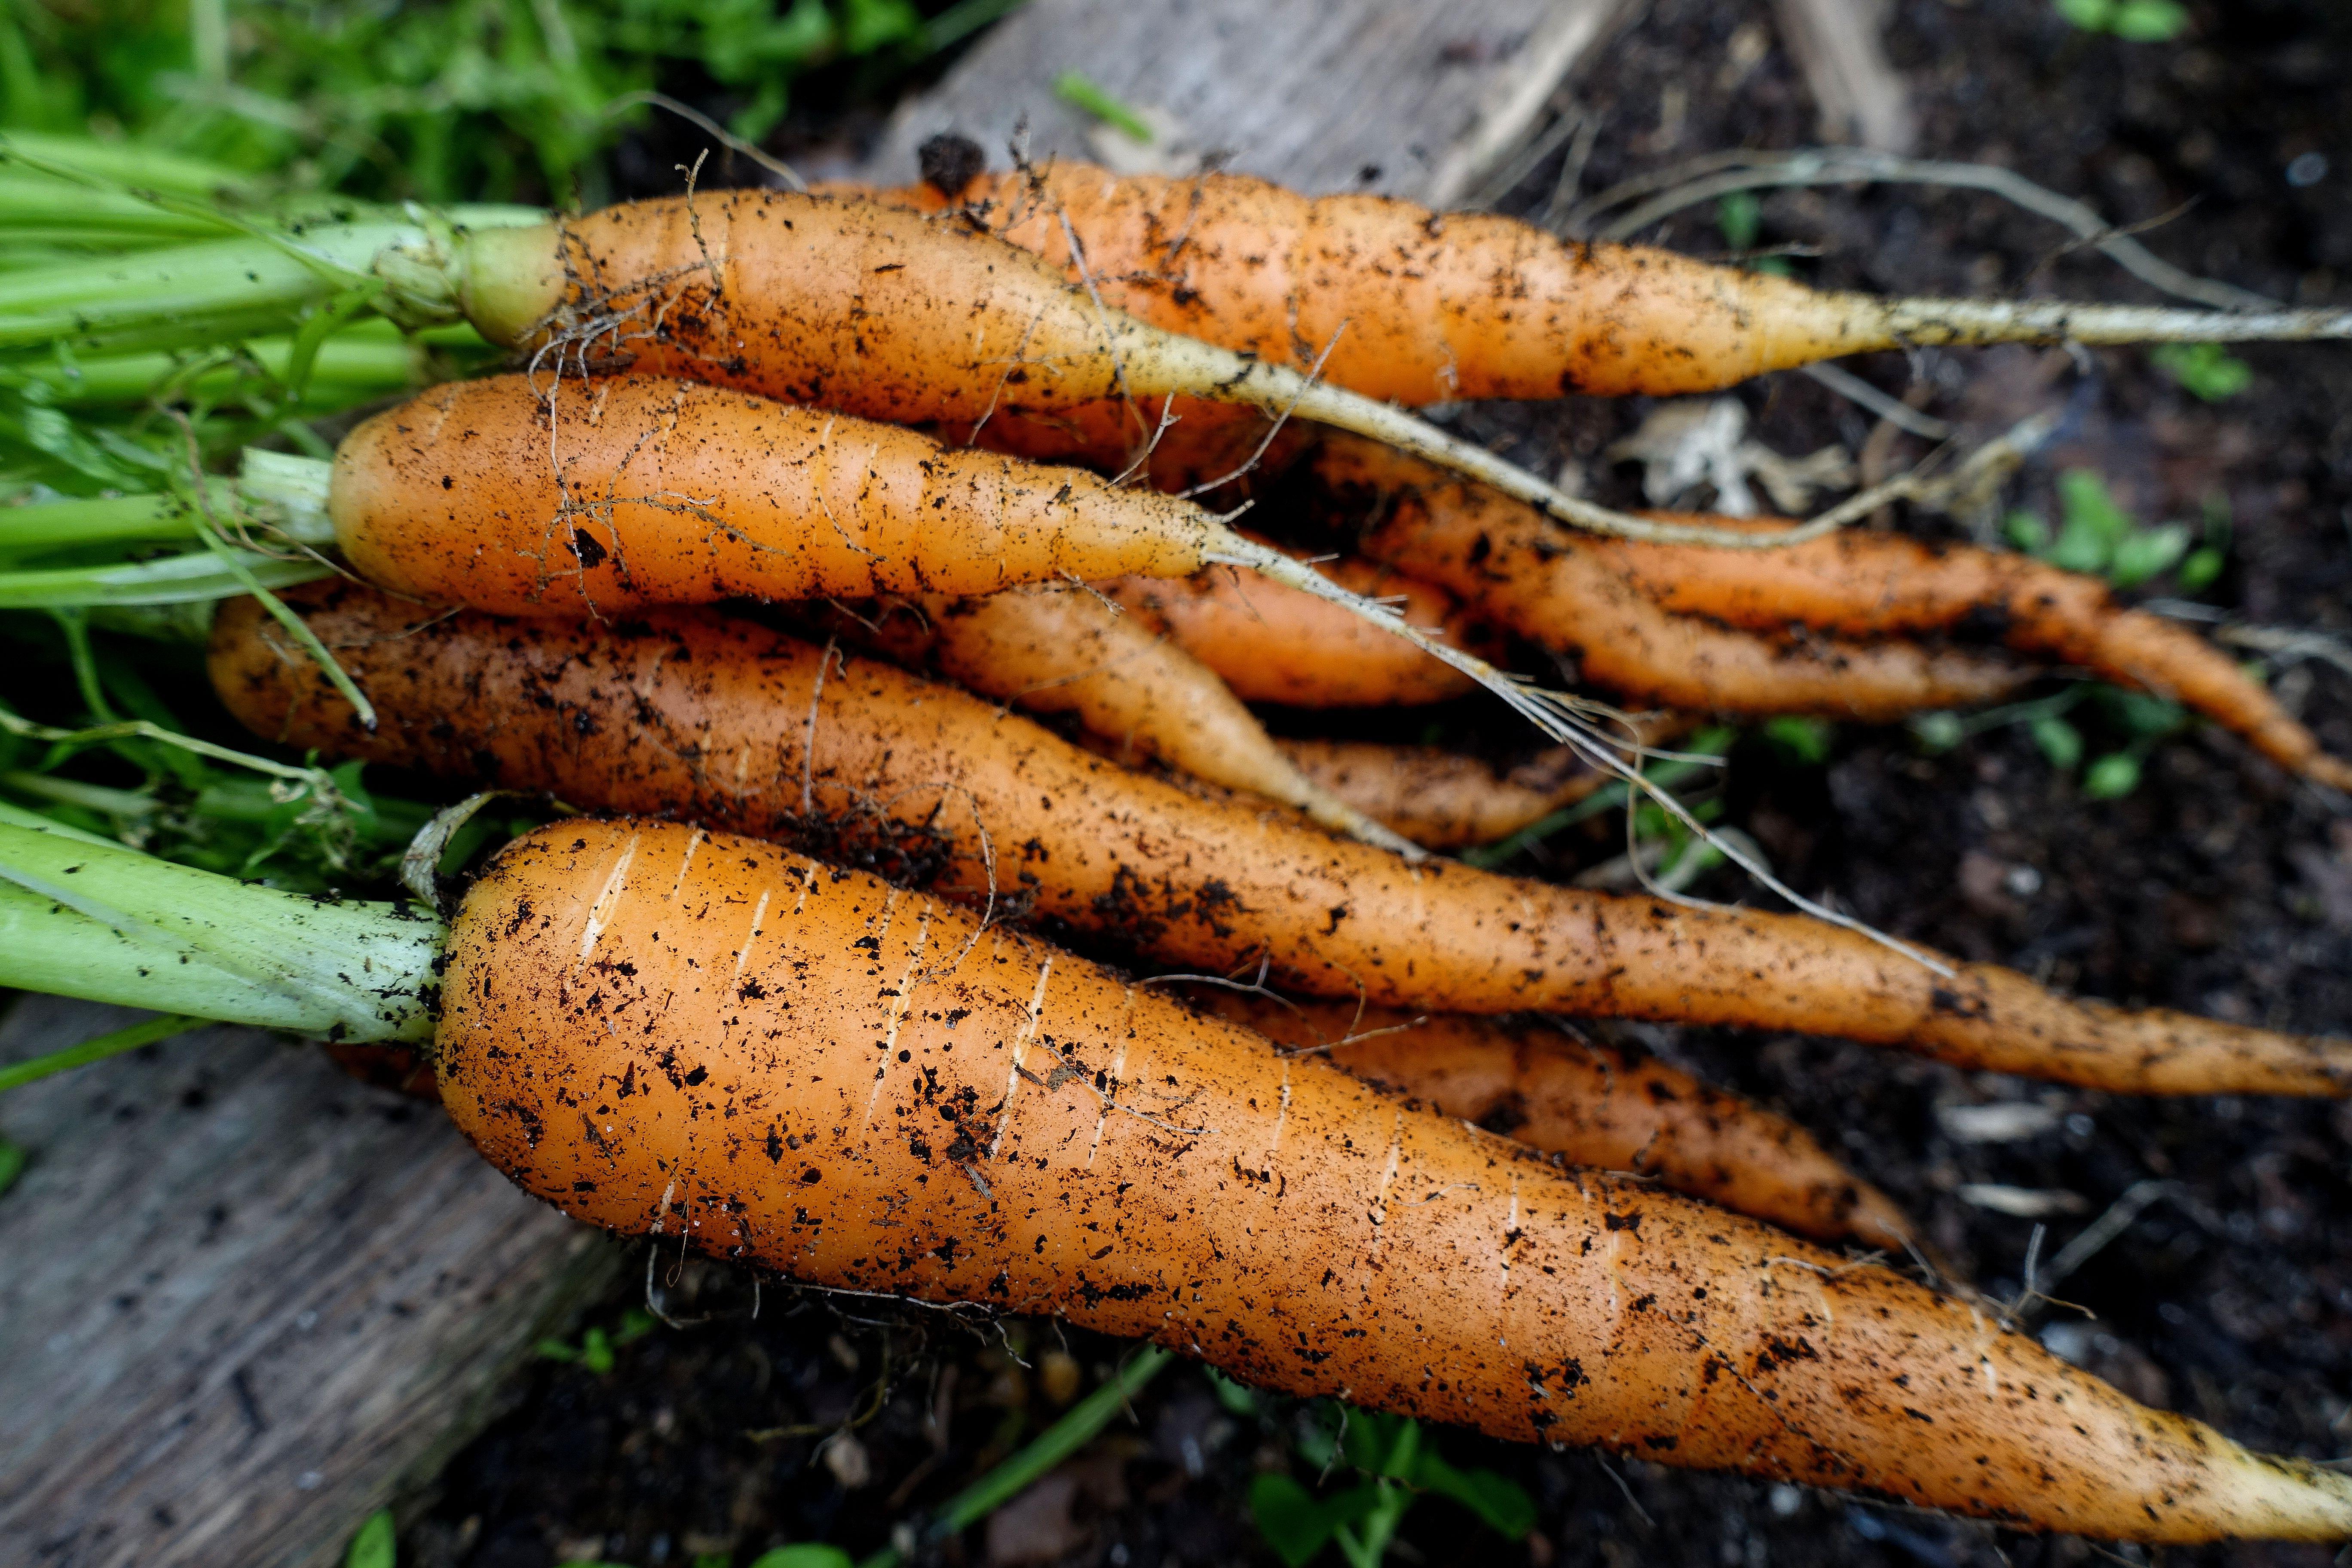 Ett knippe med nyskördade orangea morötter. Harvesting carrots, a bunch of newly harvested orange carrots.